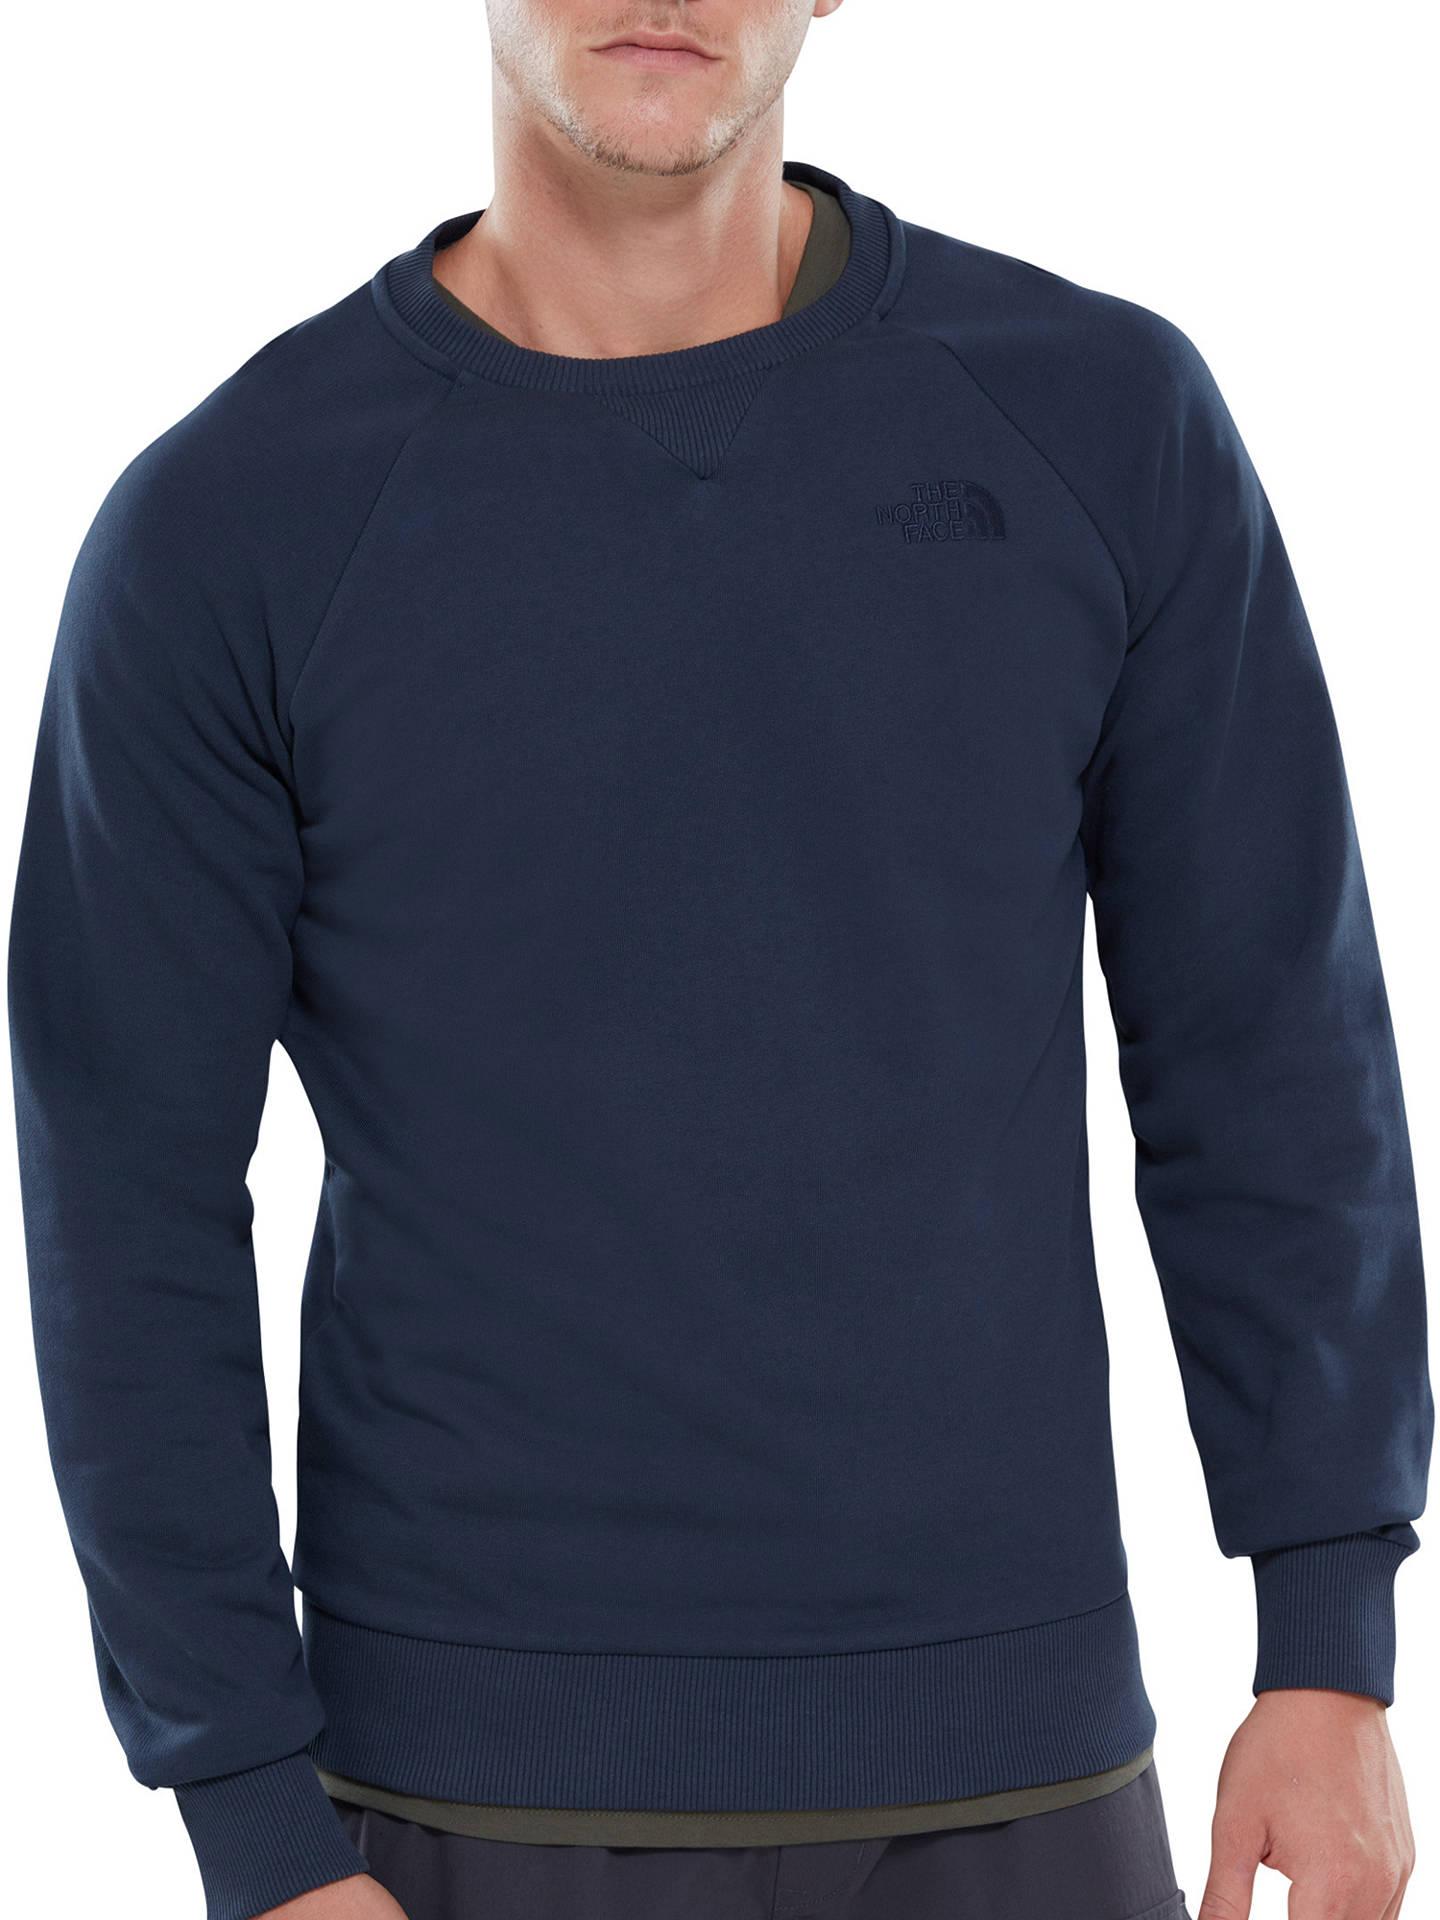 3e6e025b5 The North Face Raglan Sleeve Crew Sweatshirt at John Lewis & Partners